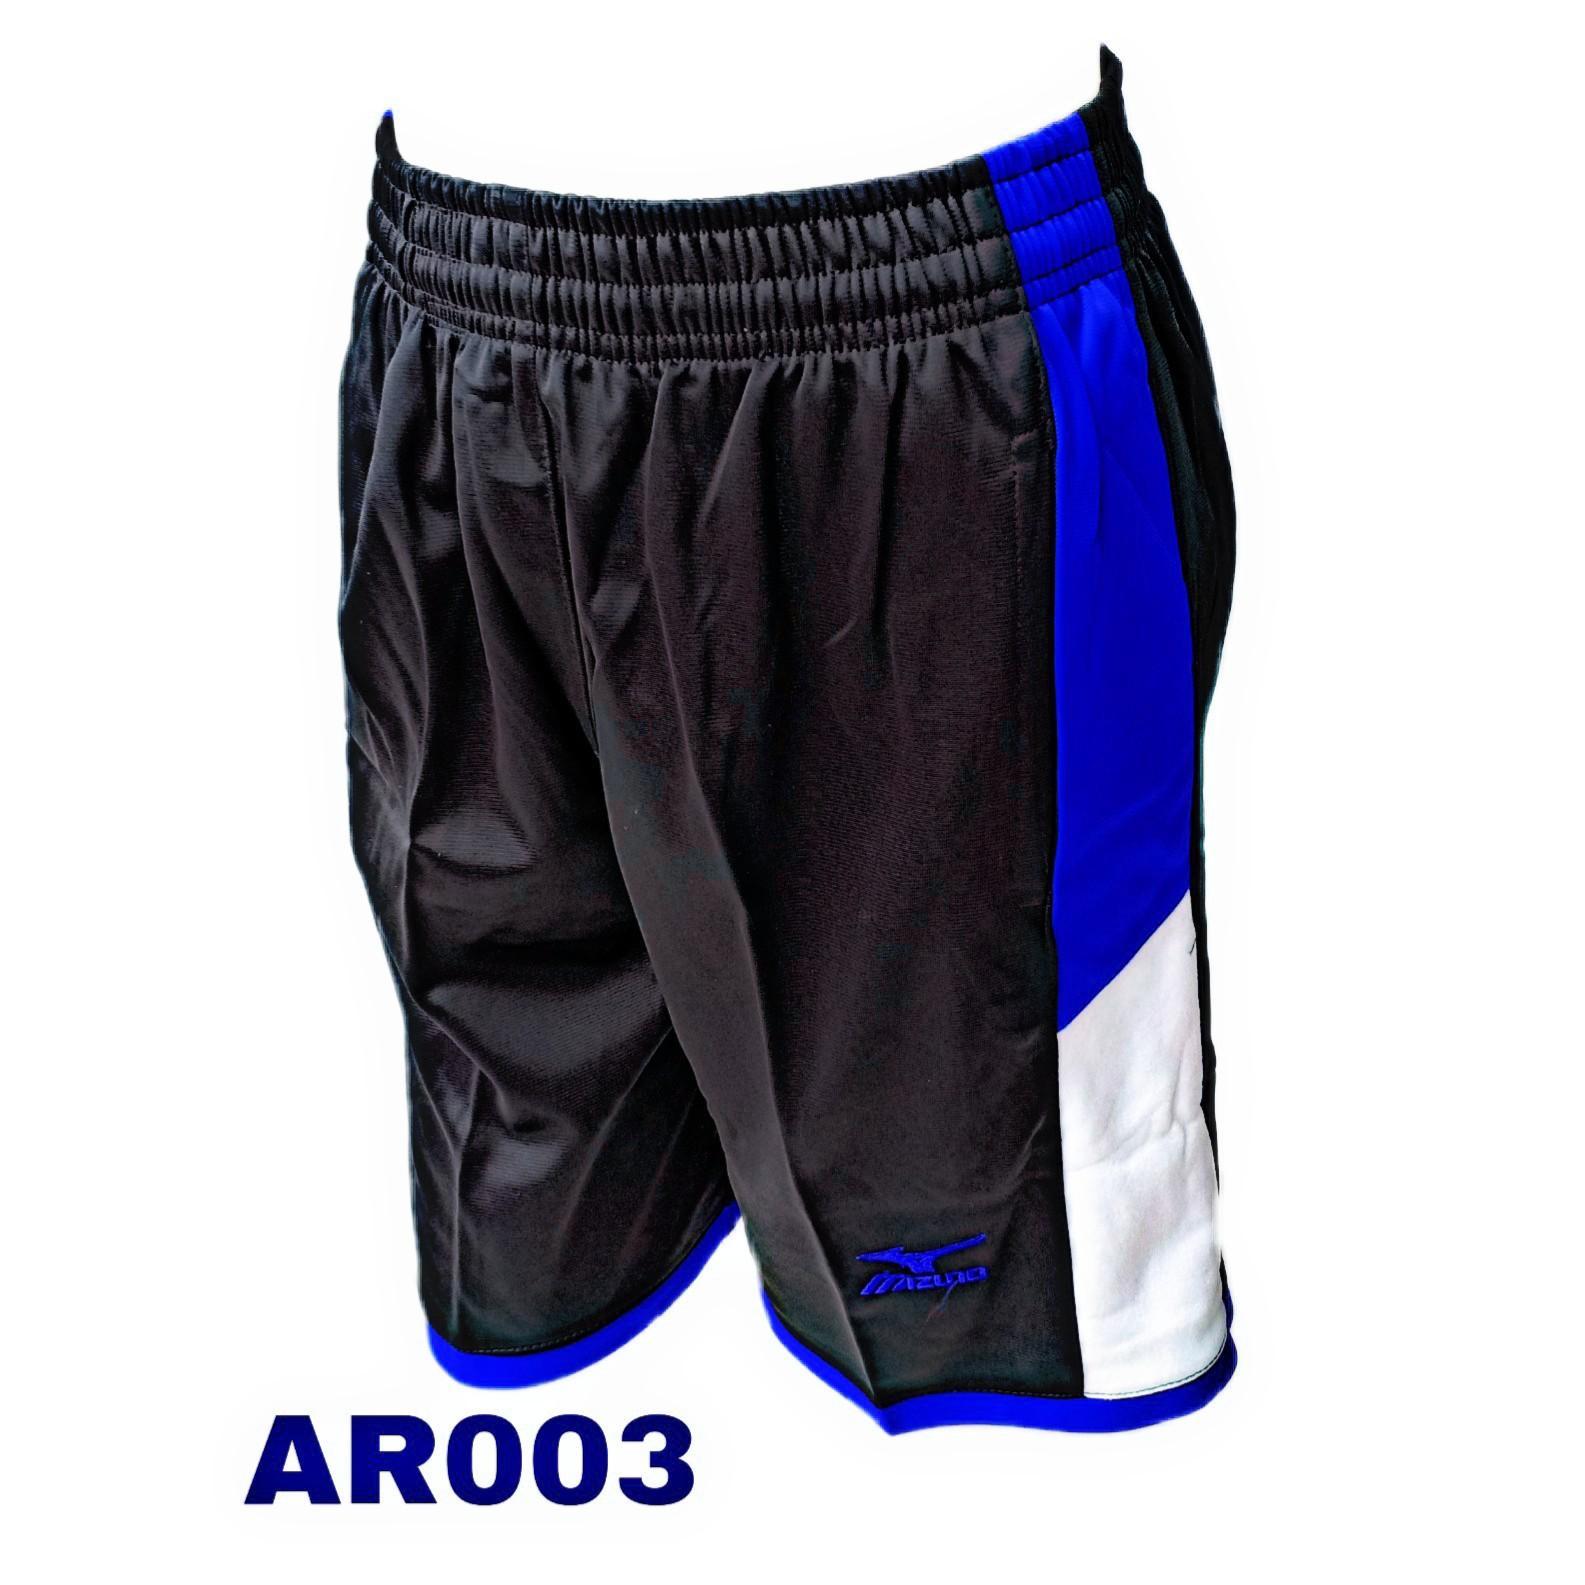 ... Model Lis 3 - Hitam Biru pon. Source · Arsy Sport / Celana Pendek Pria / Celana Training / Celana Pria / Celana Wanita AR003